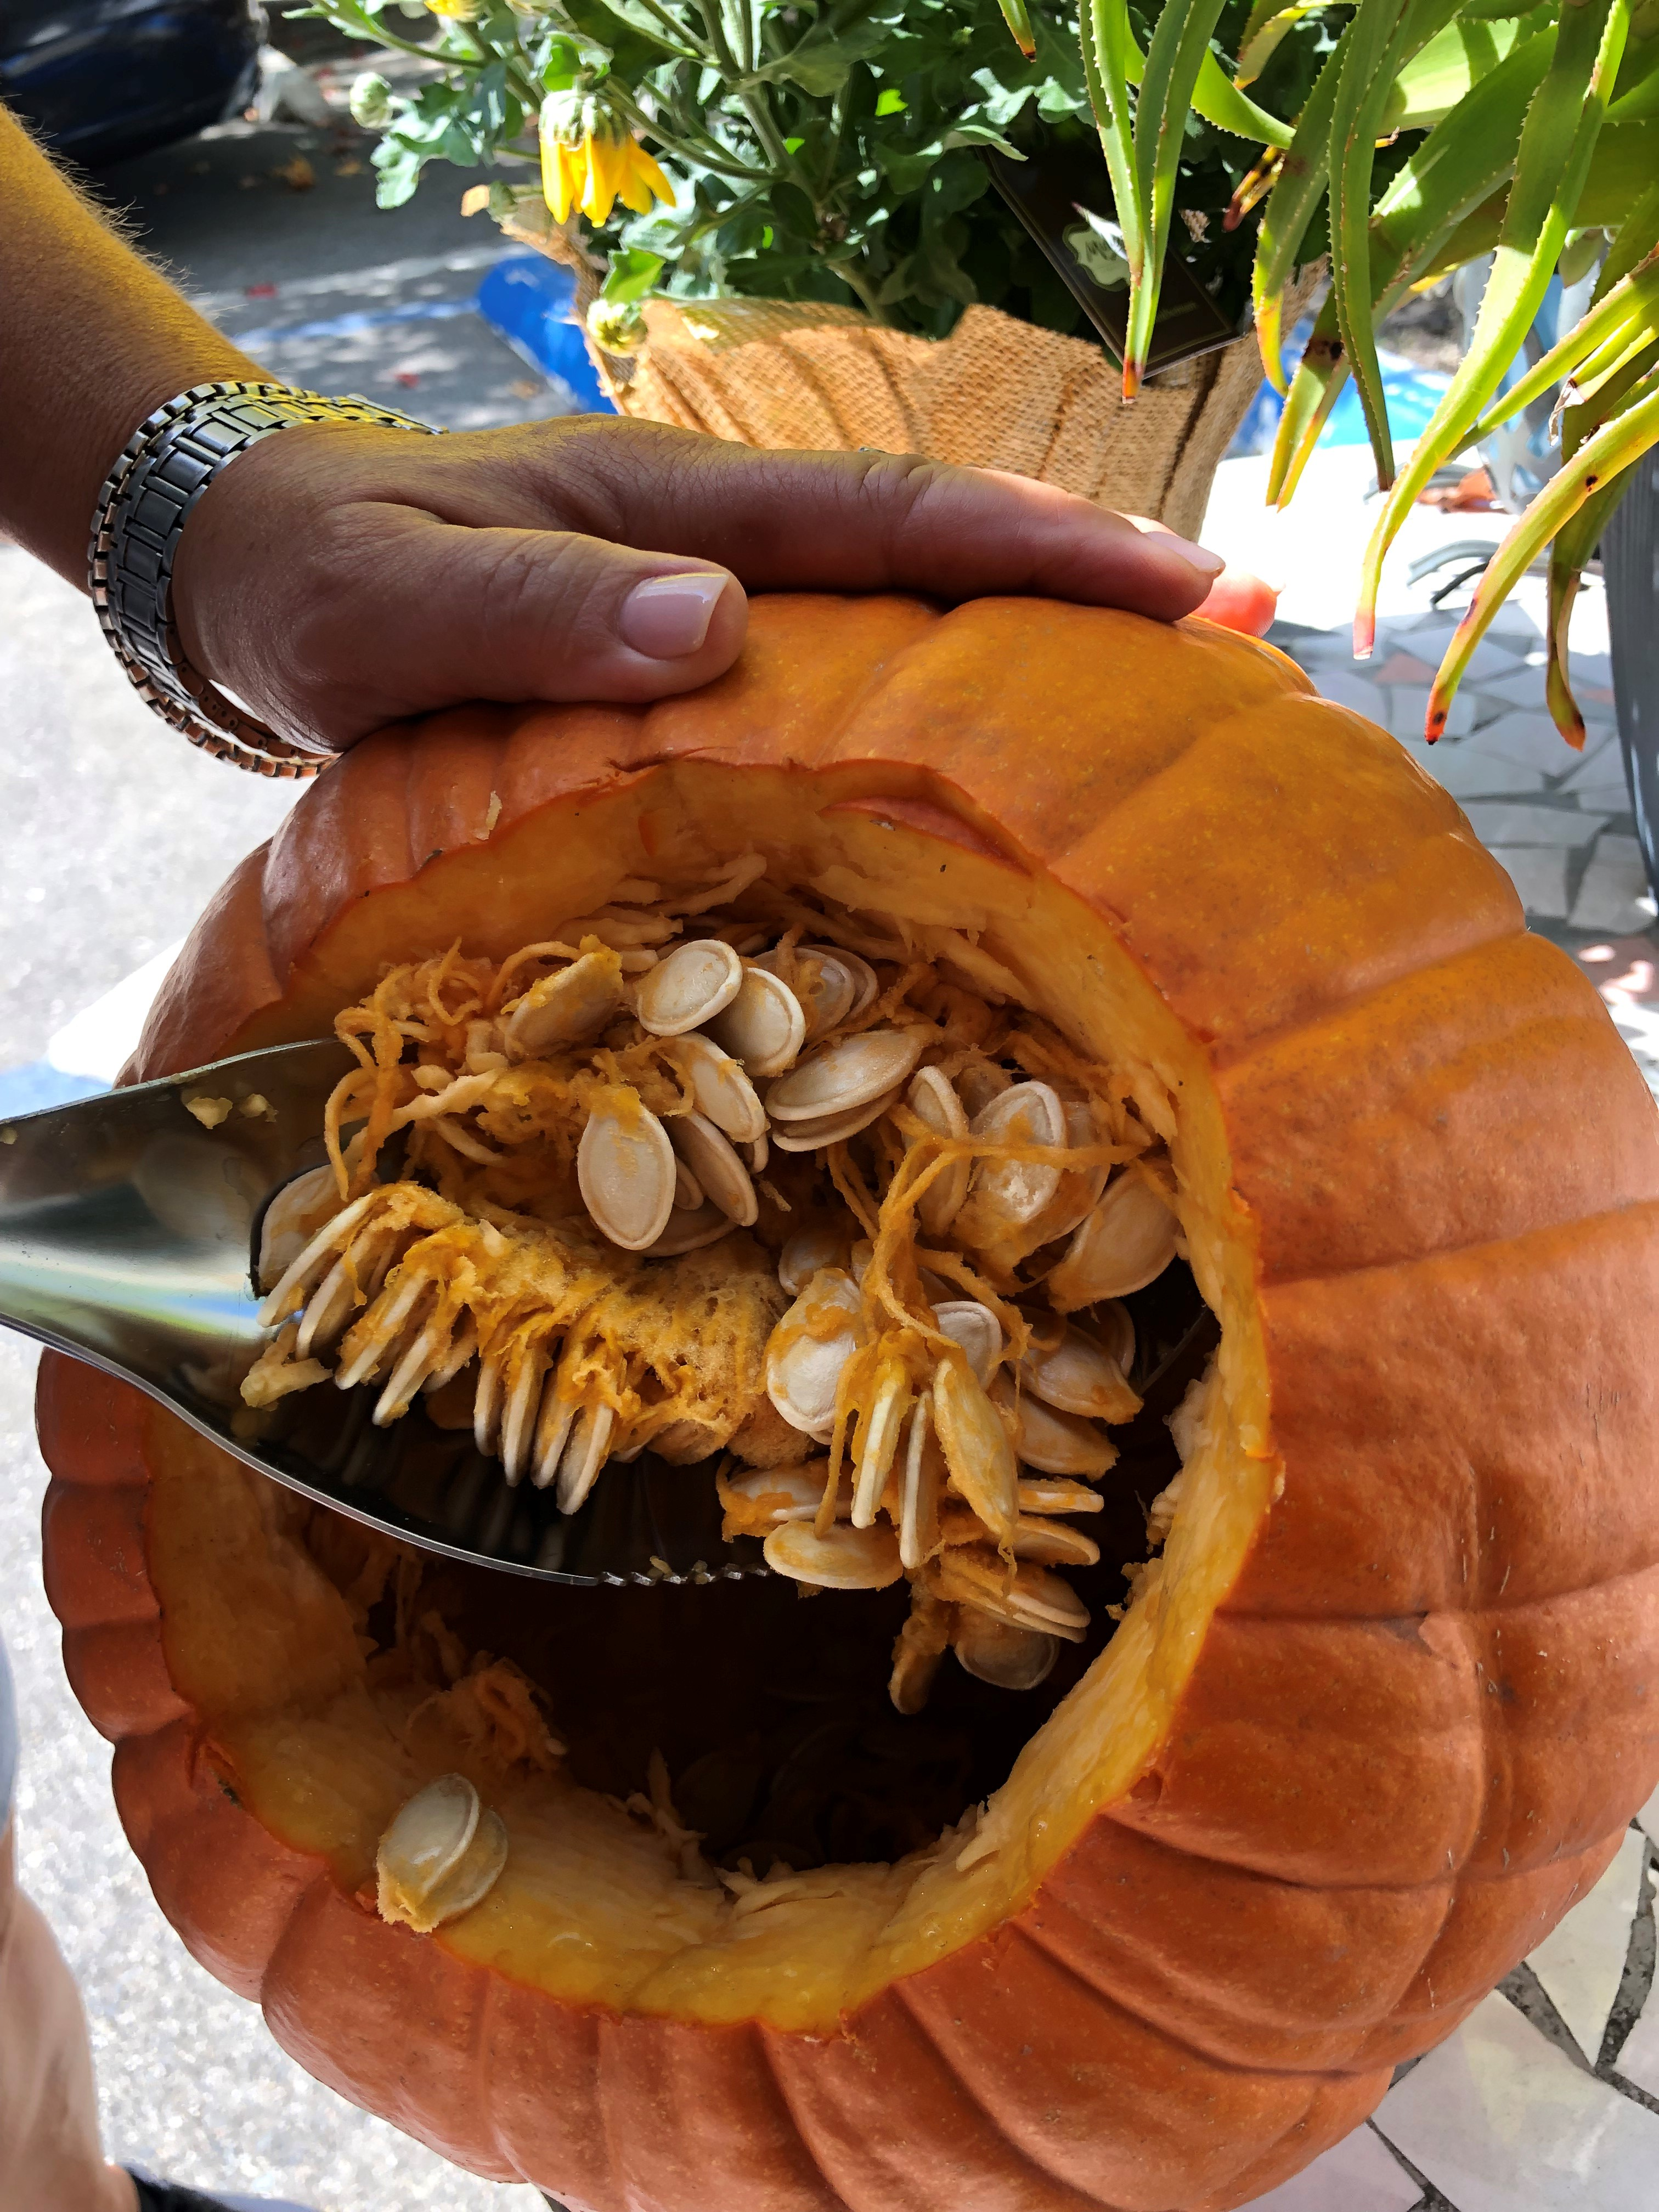 Roxanne DePalma using the Dirty Little Digger in a pumpkin